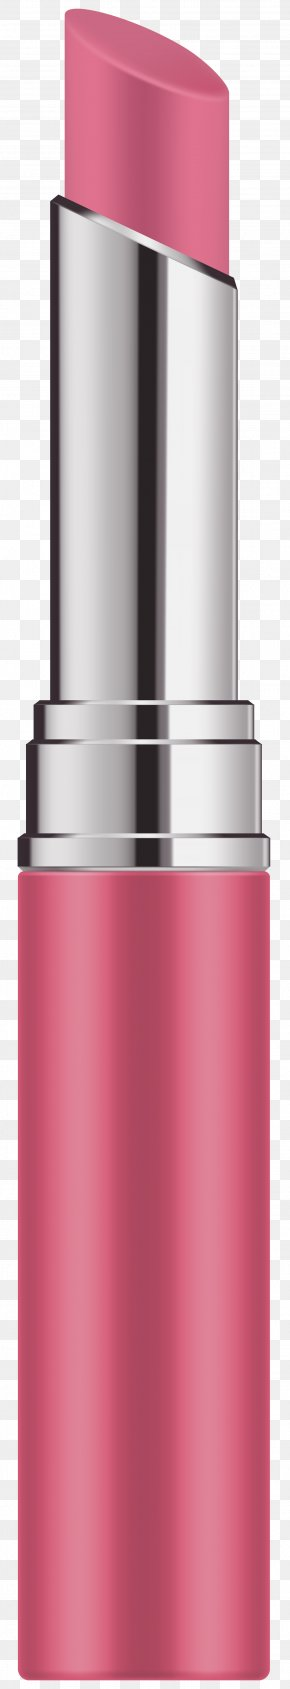 Pink Lipstick Clip Art Image - Lipstick Product Design PNG